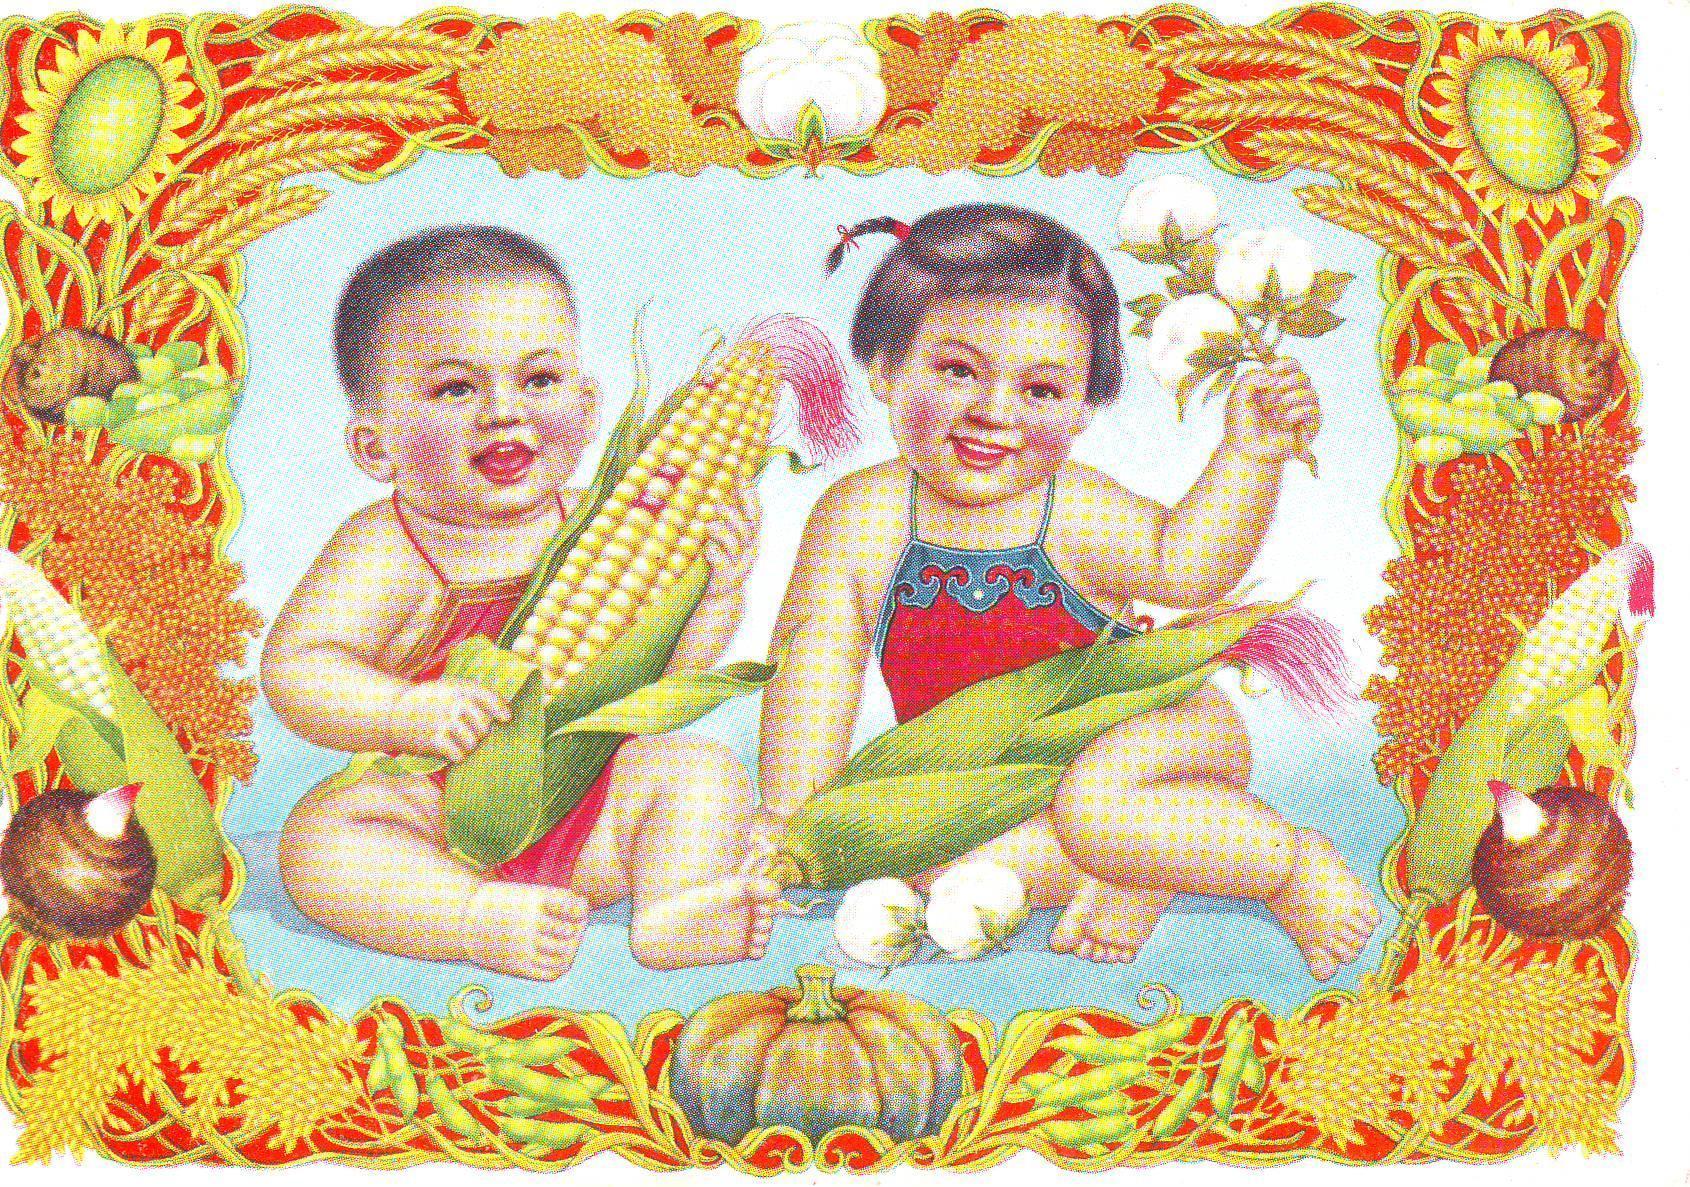 Советские детские открытки фото 86